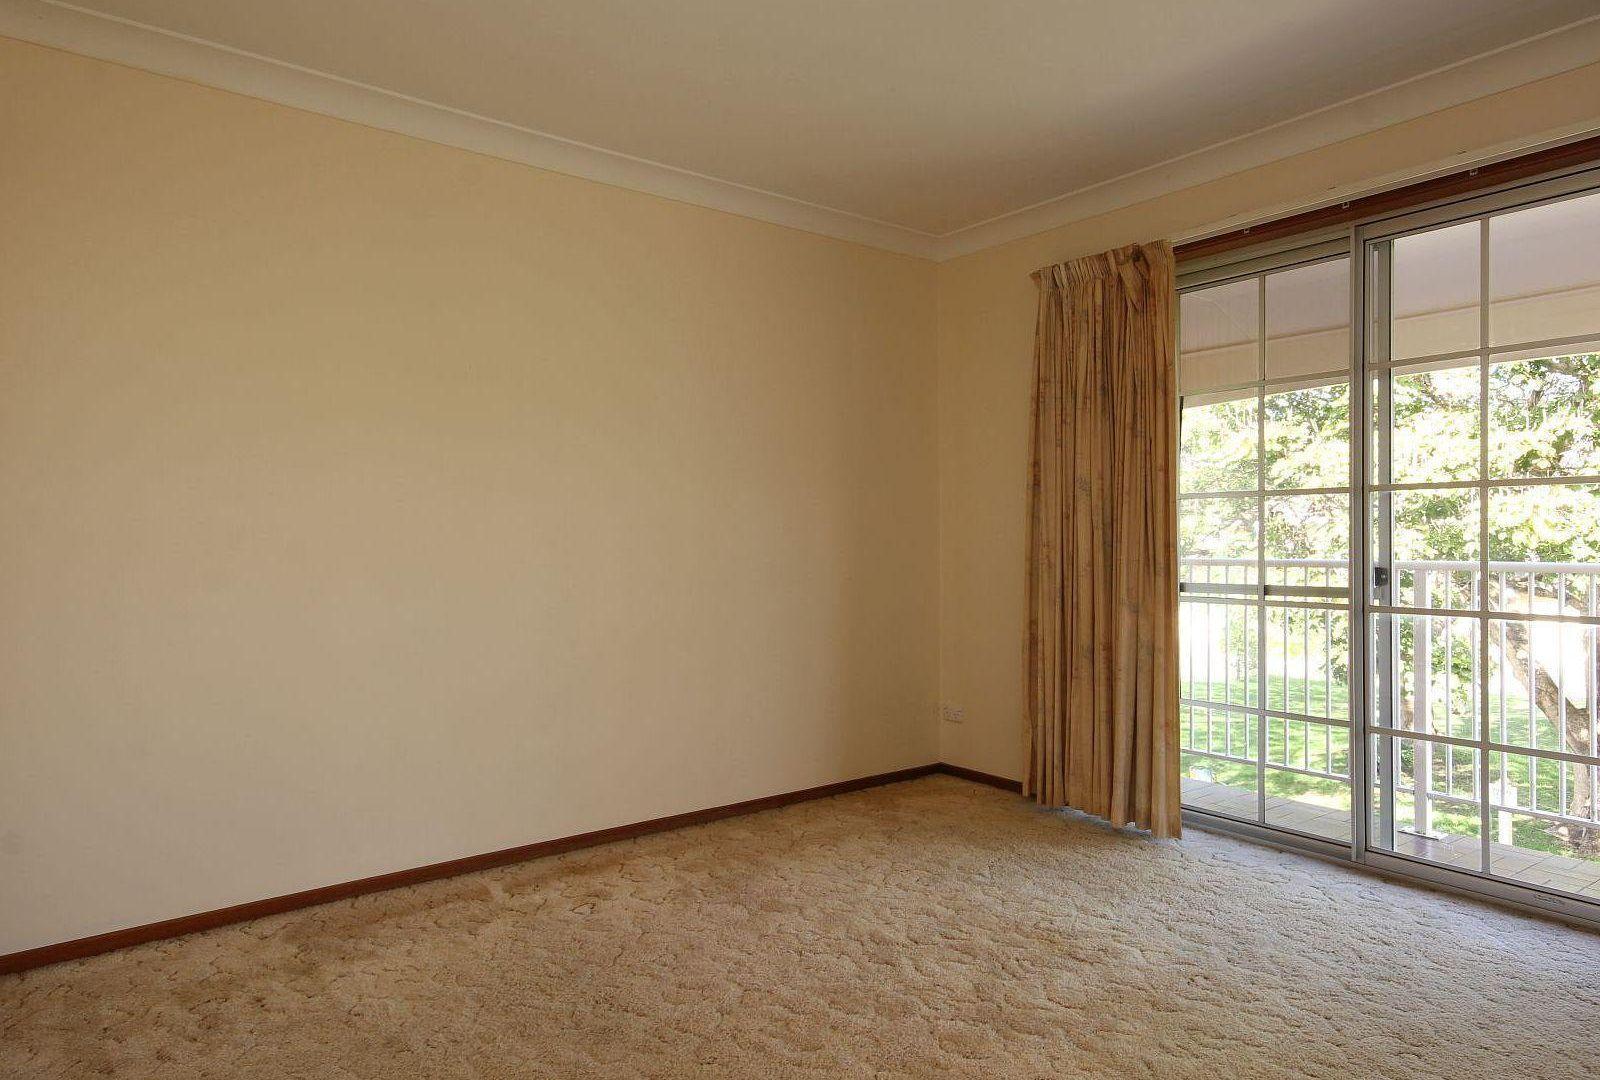 15/114 Cherry Street, Ballina NSW 2478, Image 1